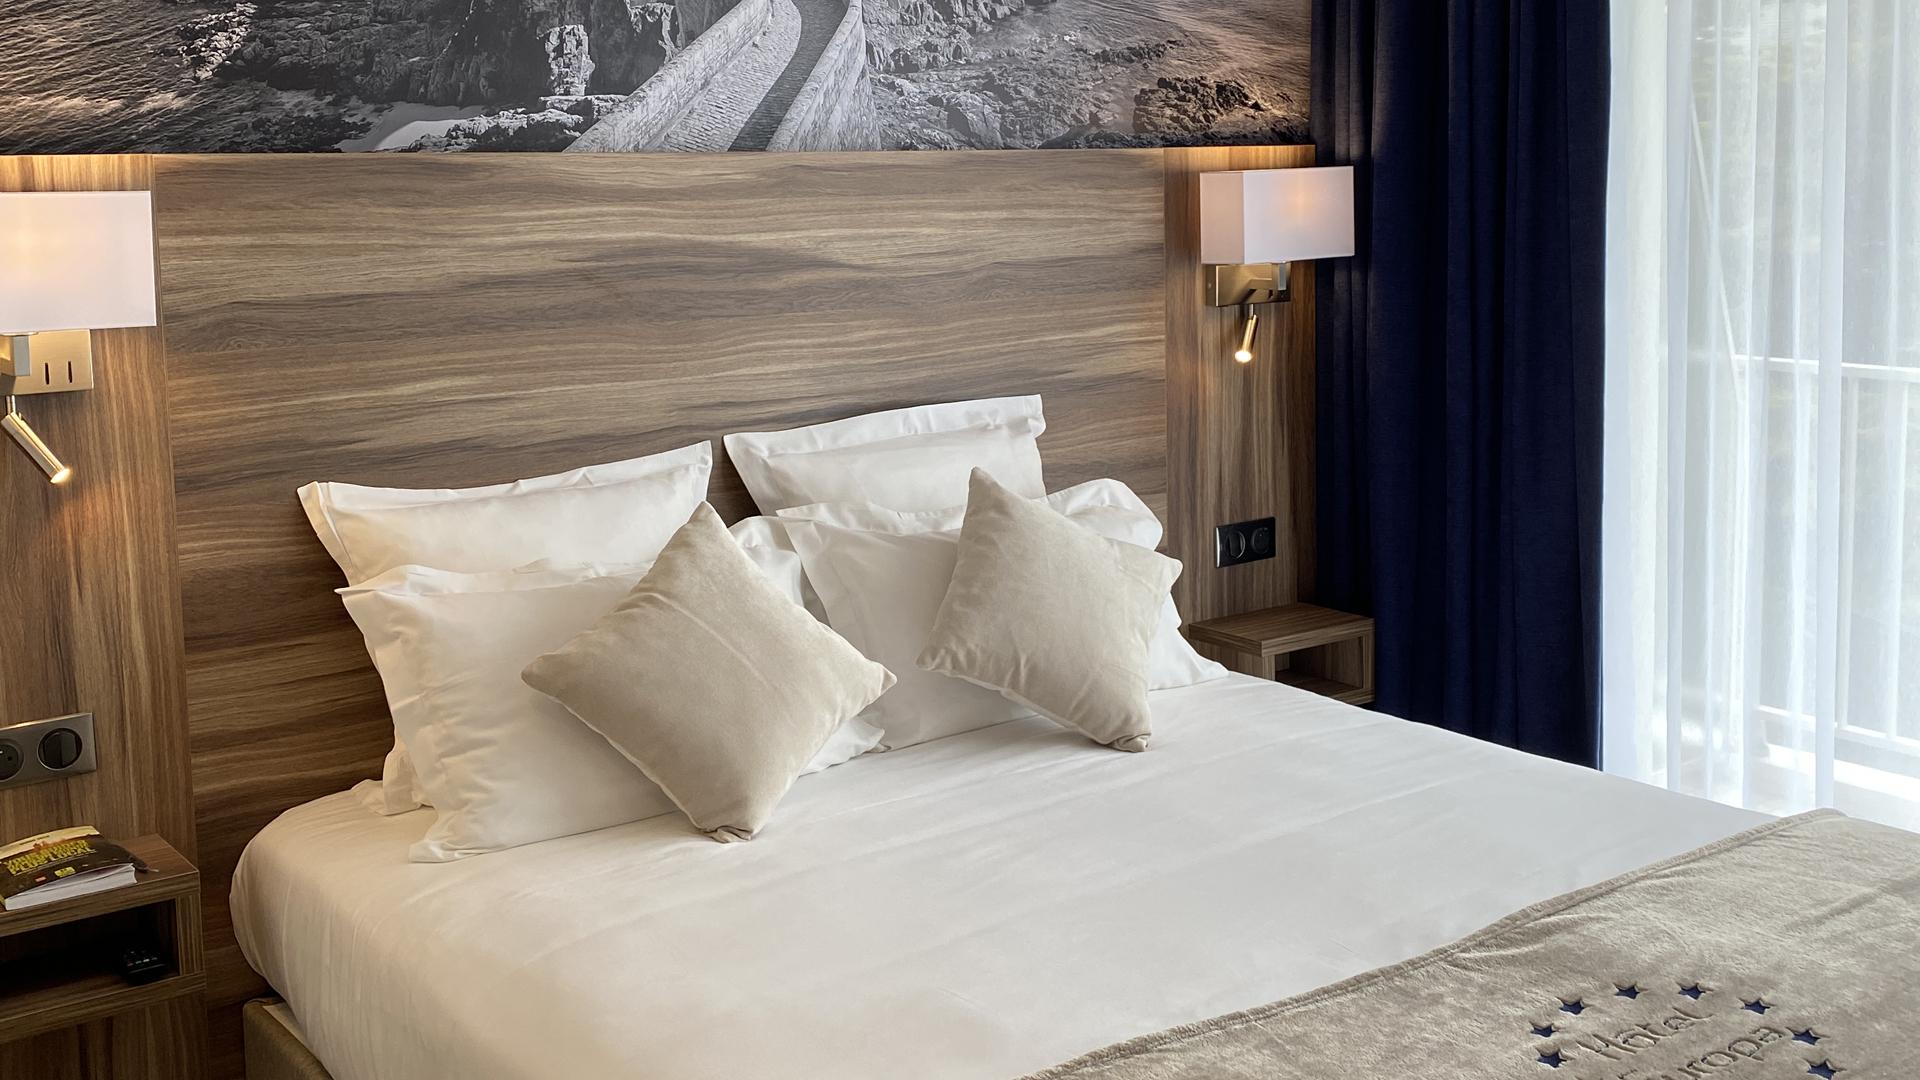 hotel-chambre-elegance-vue-jardin-quiberon-hotel-europa-diaporama2020